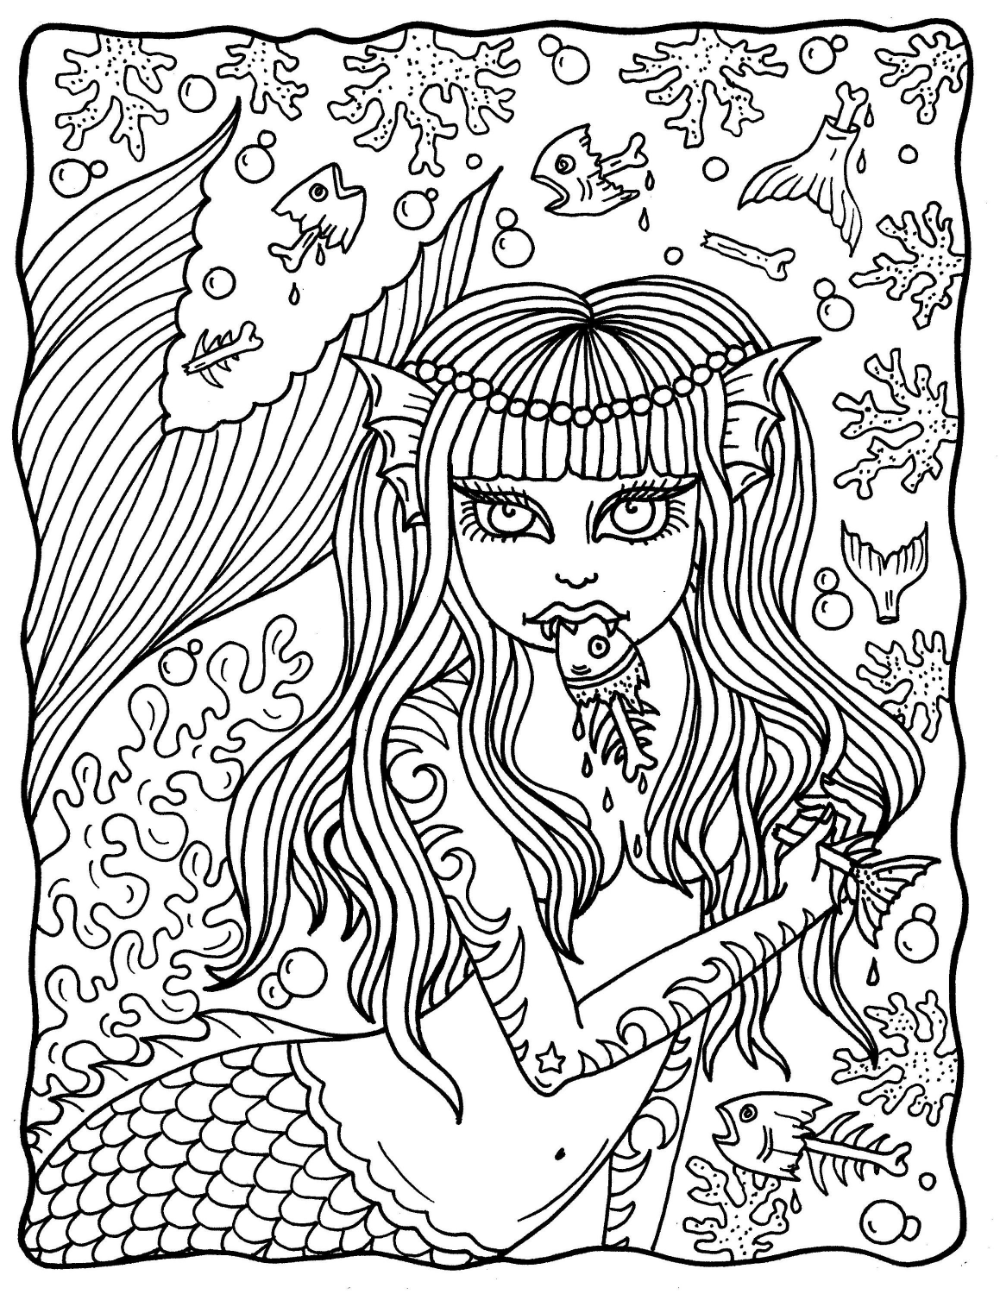 Mermaid Nightmares Pdf Downloadable Printable Digital Coloring Book Mermads Sirens Halloween Scary Love Coloring Pages Coloring Books Fairy Coloring Book [ 1294 x 1000 Pixel ]